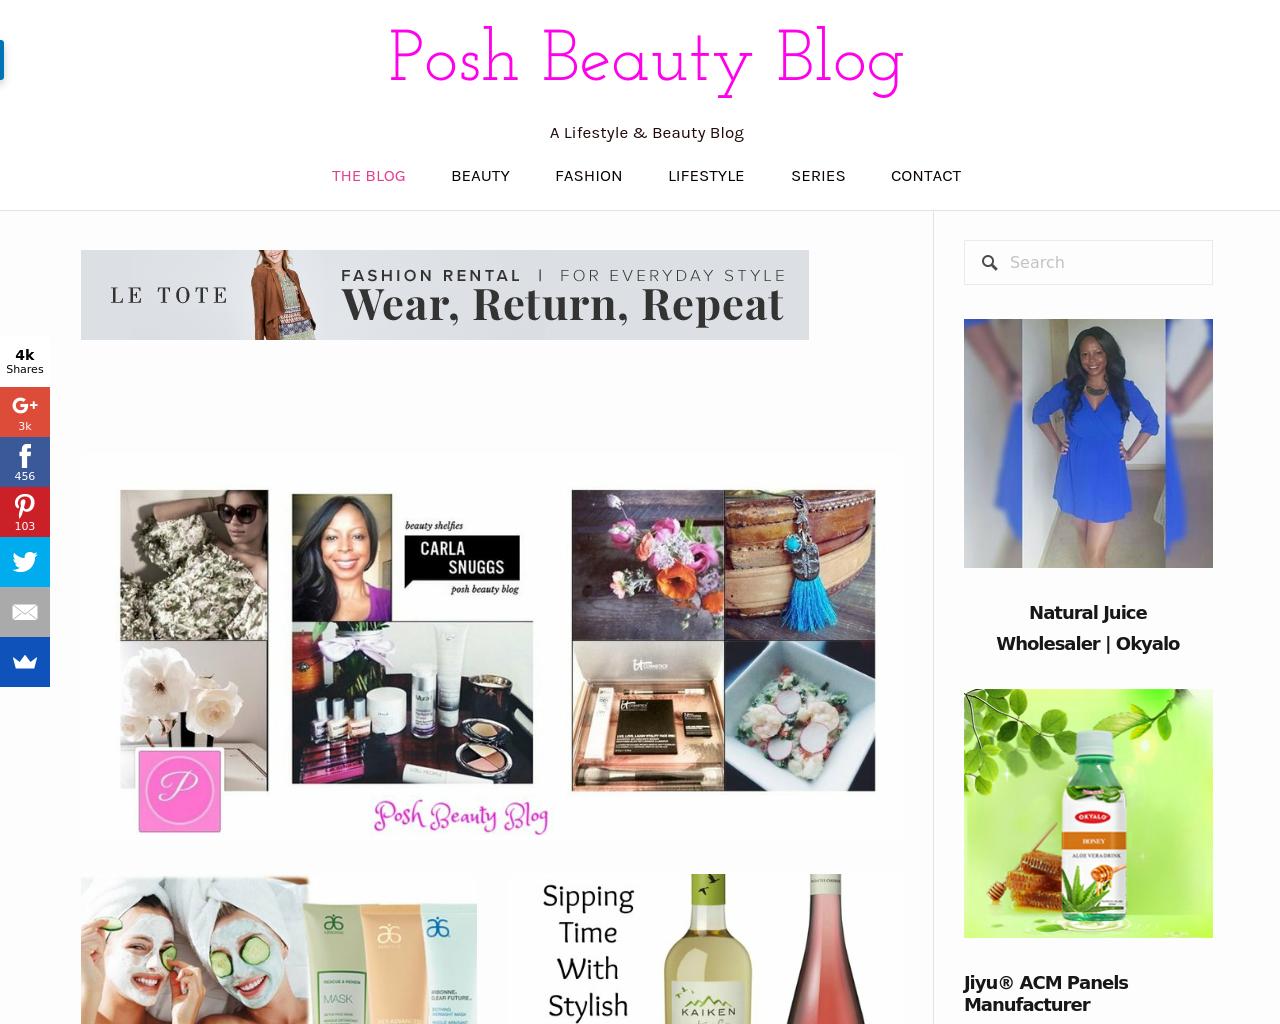 Posh-Beauty-Blog-Advertising-Reviews-Pricing